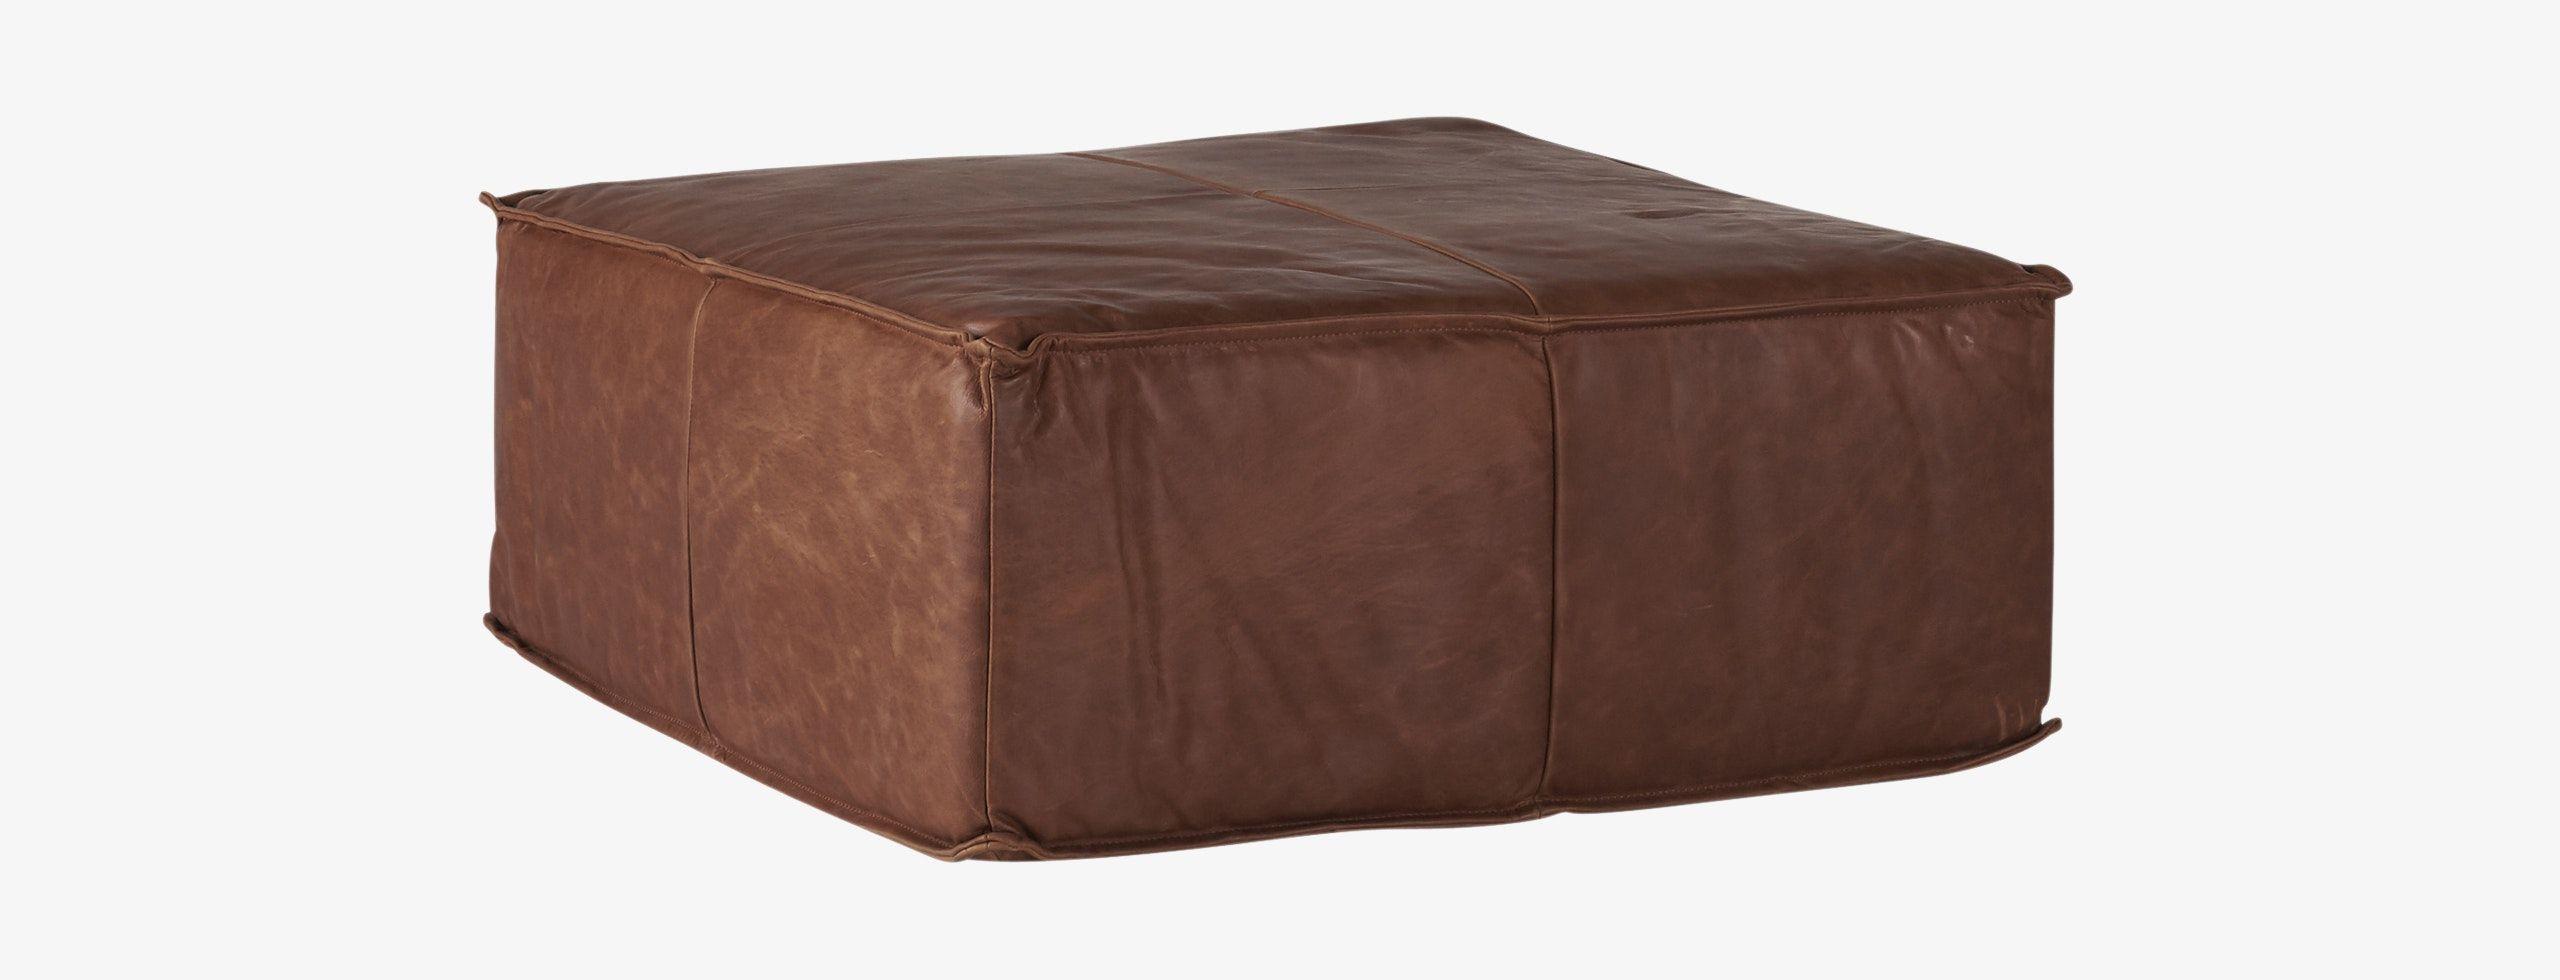 Wondrous Lyle Leather Ottoman Design In 2019 Leather Ottoman Creativecarmelina Interior Chair Design Creativecarmelinacom